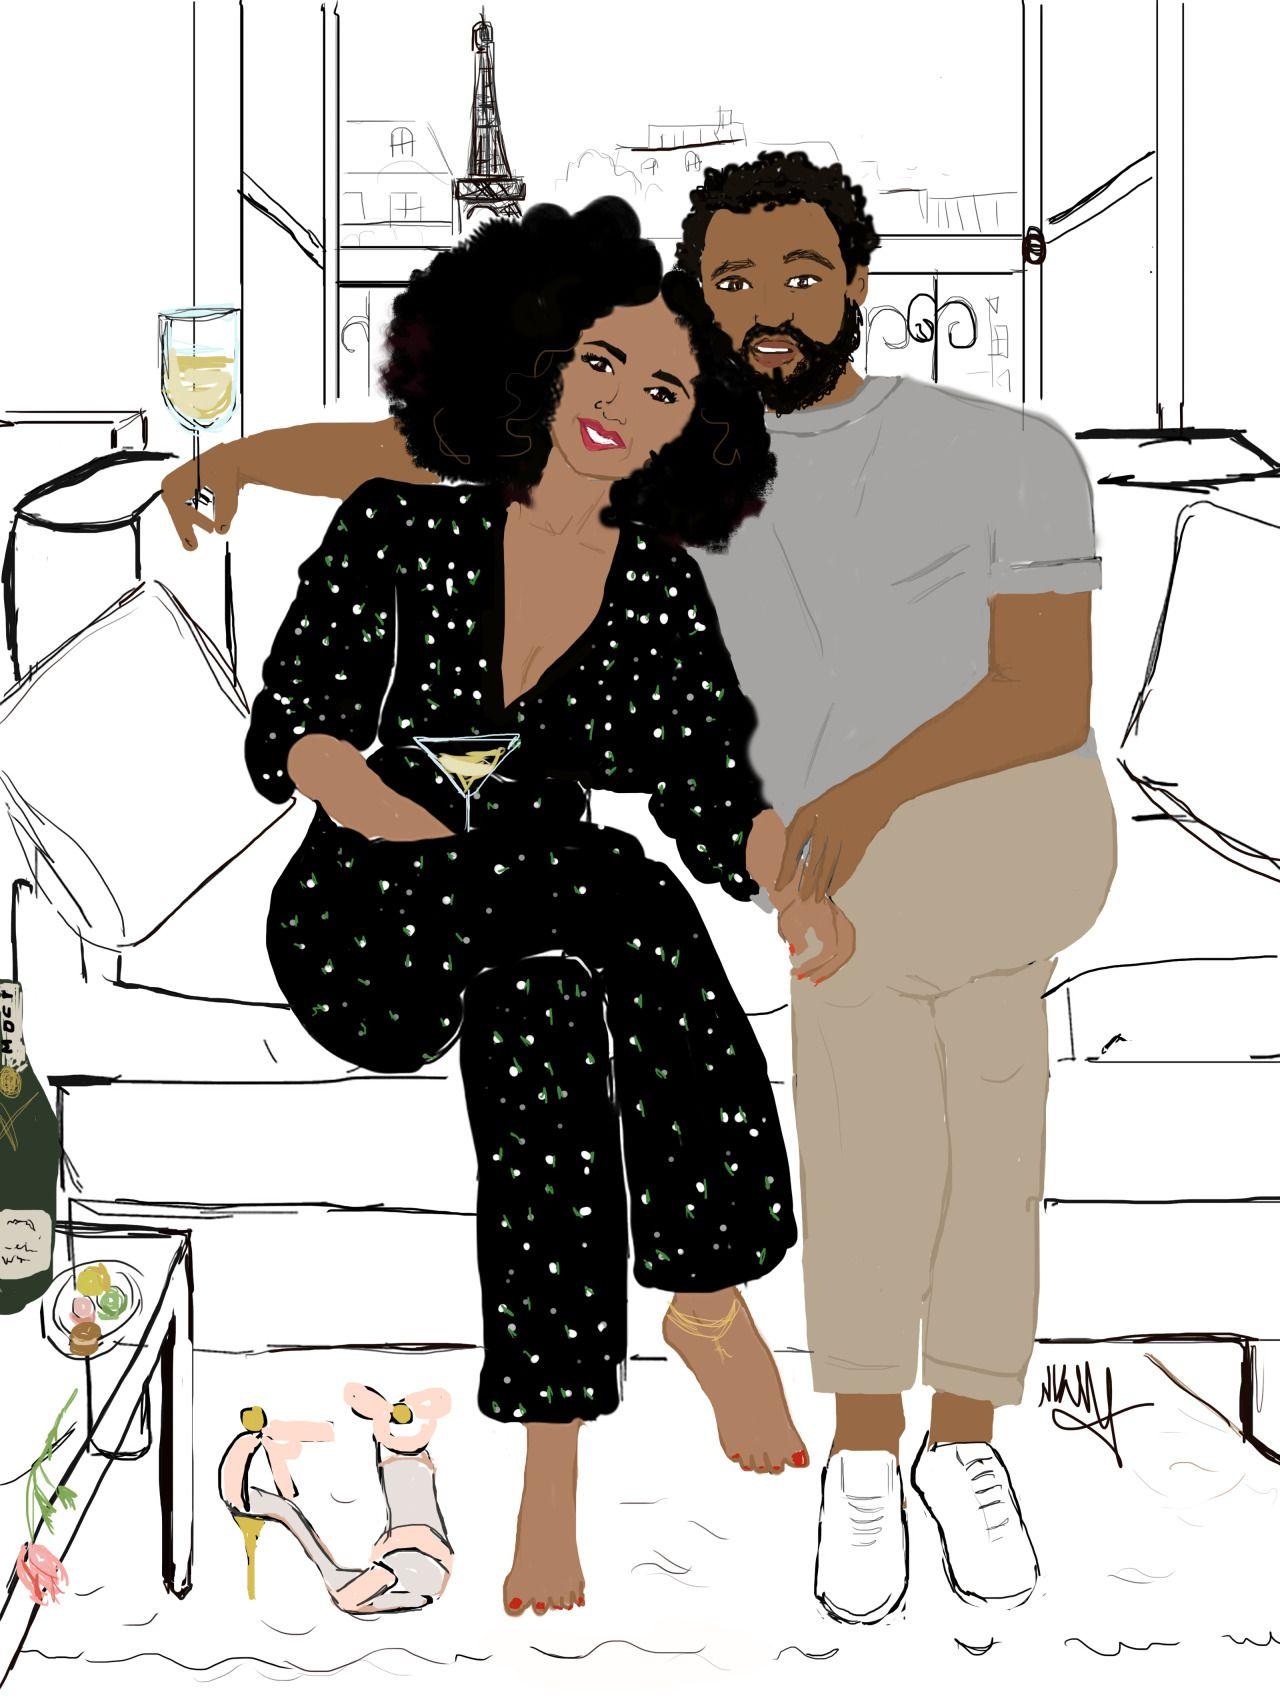 Black lovers in paree love you paris